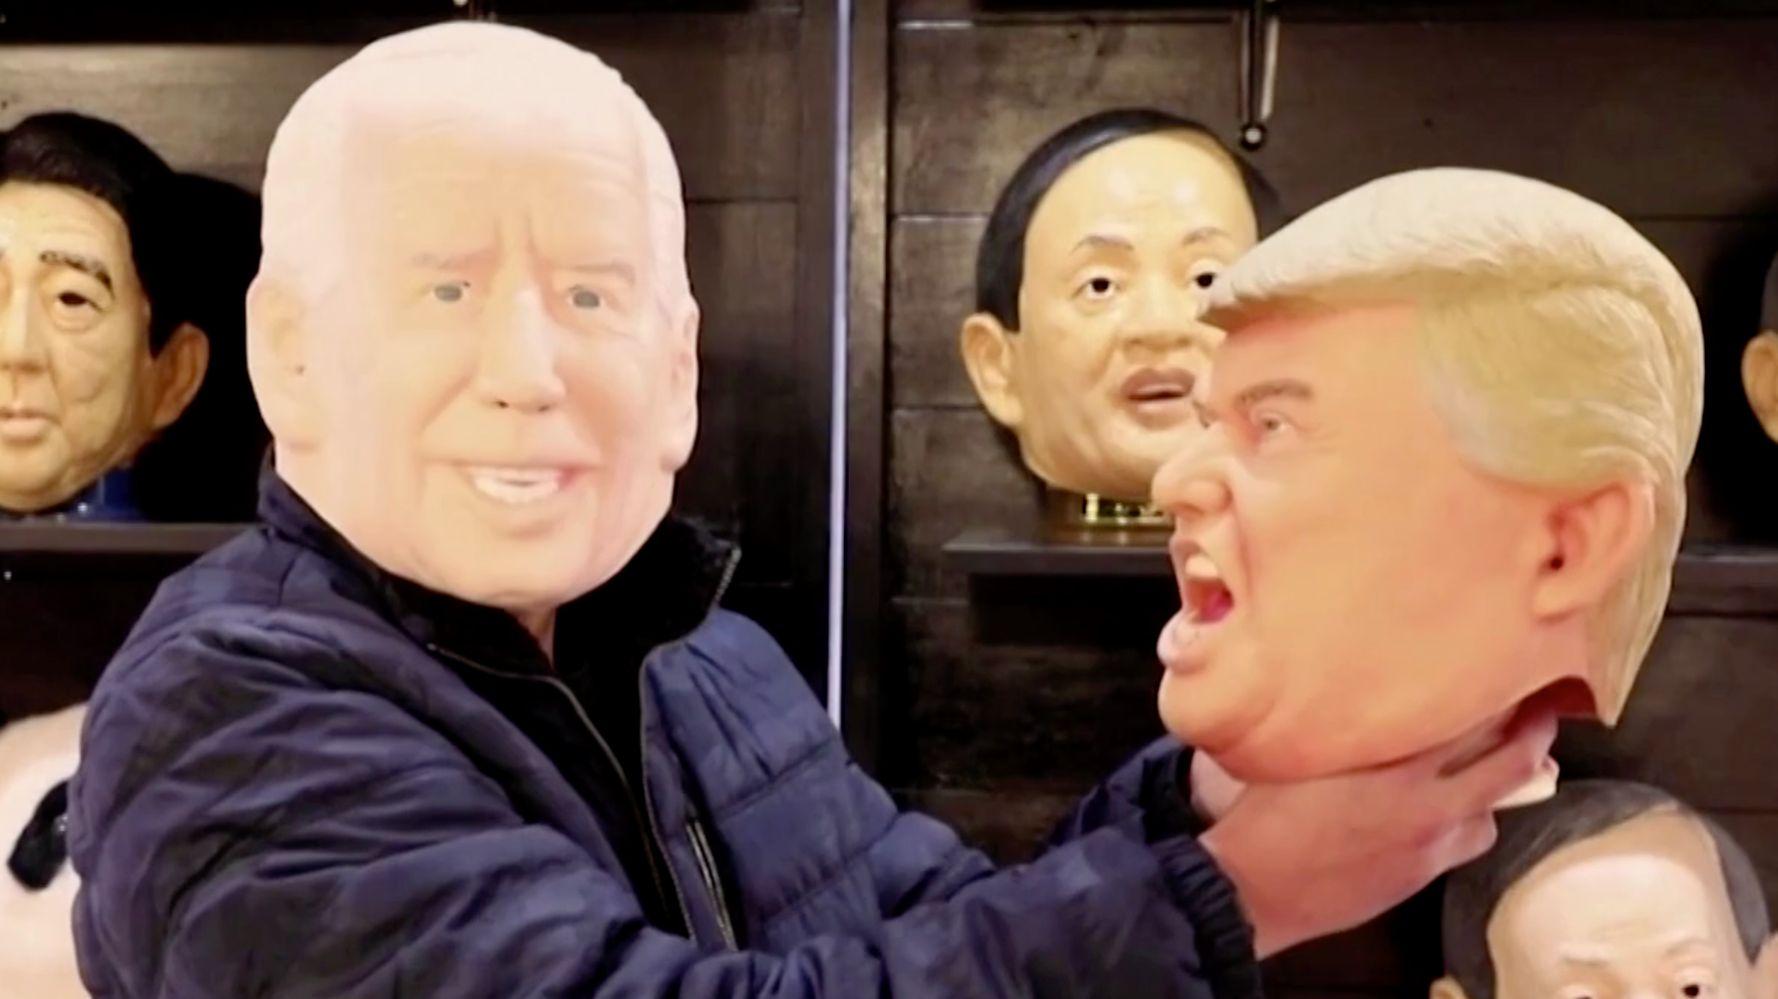 Japanese Mask Maker Dumps Trump, Embraces Biden